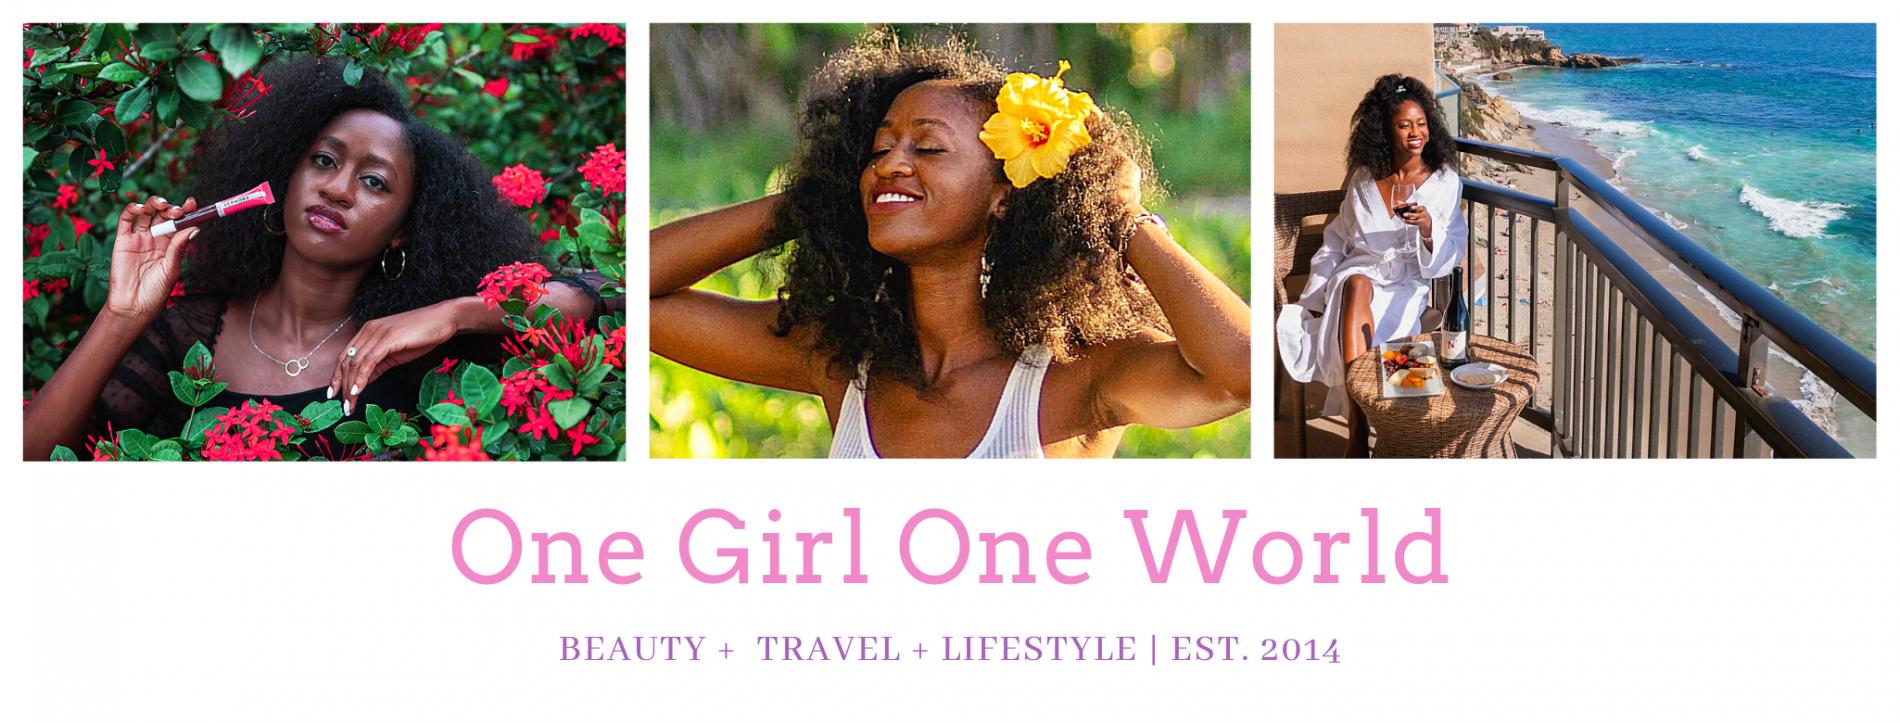 One Girl One World